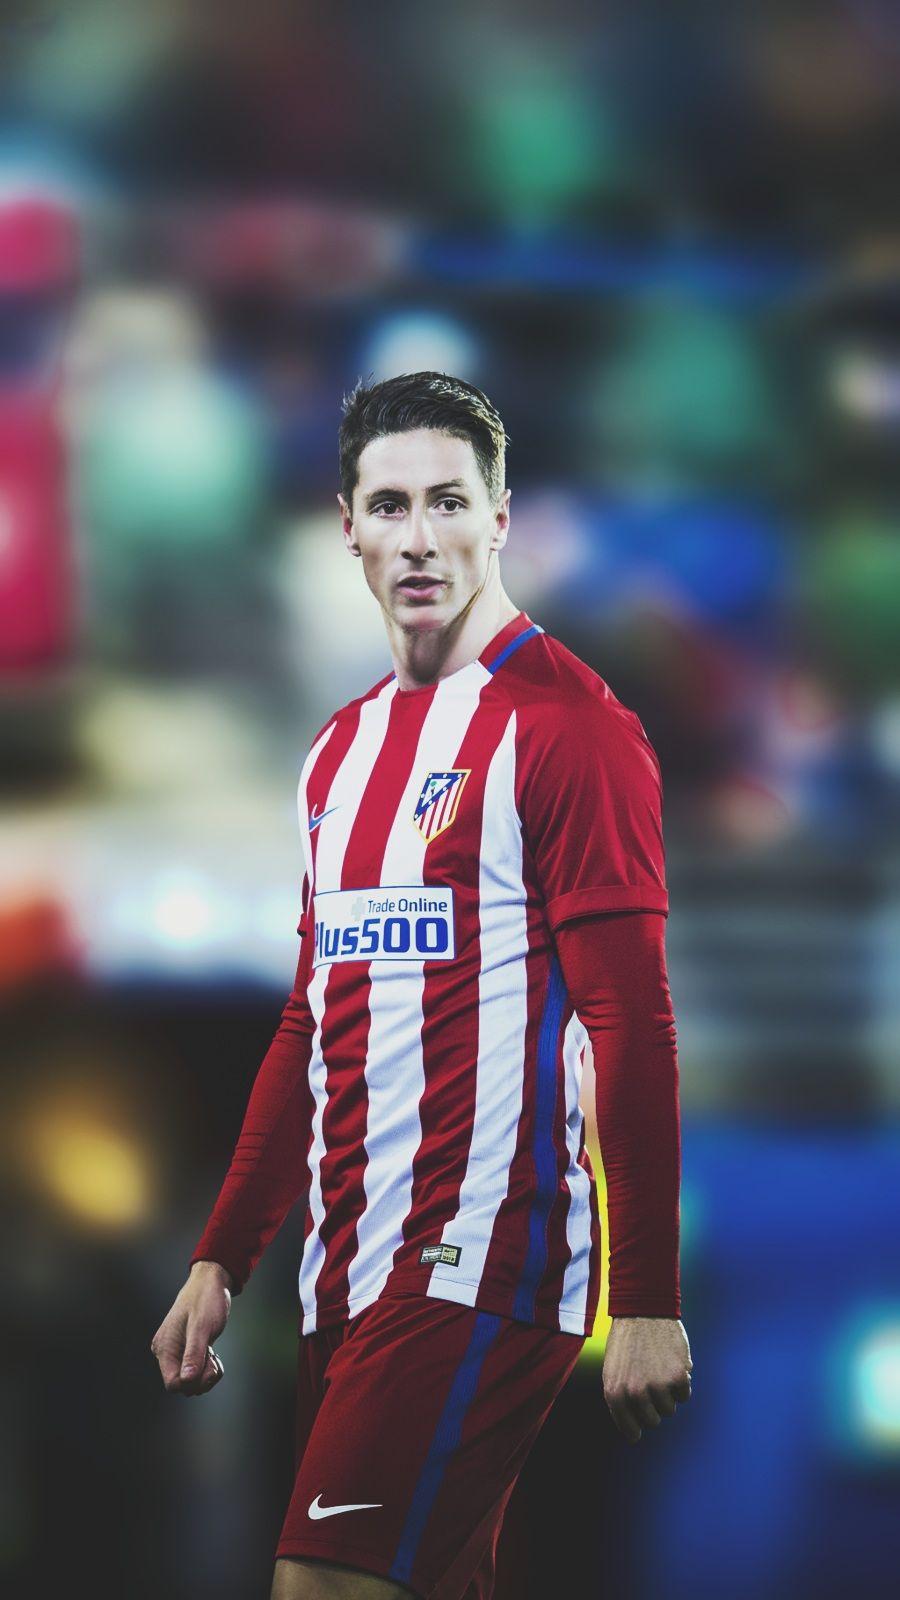 Atlético Madrid 17 Athlete, Sports, Soccer